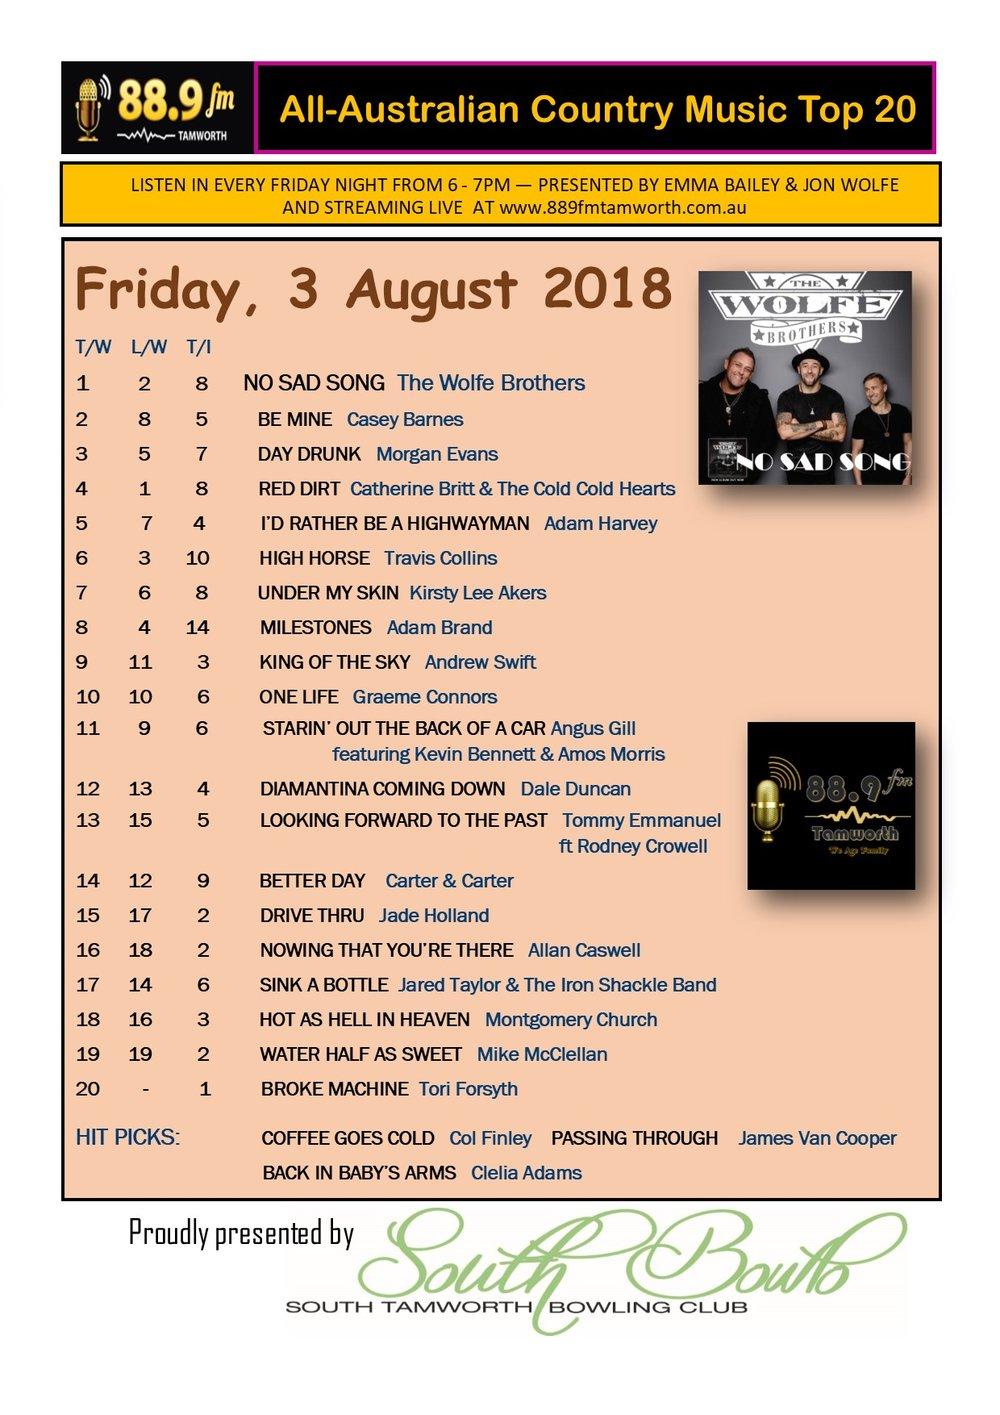 889FM CHART 3 August 2018.jpg